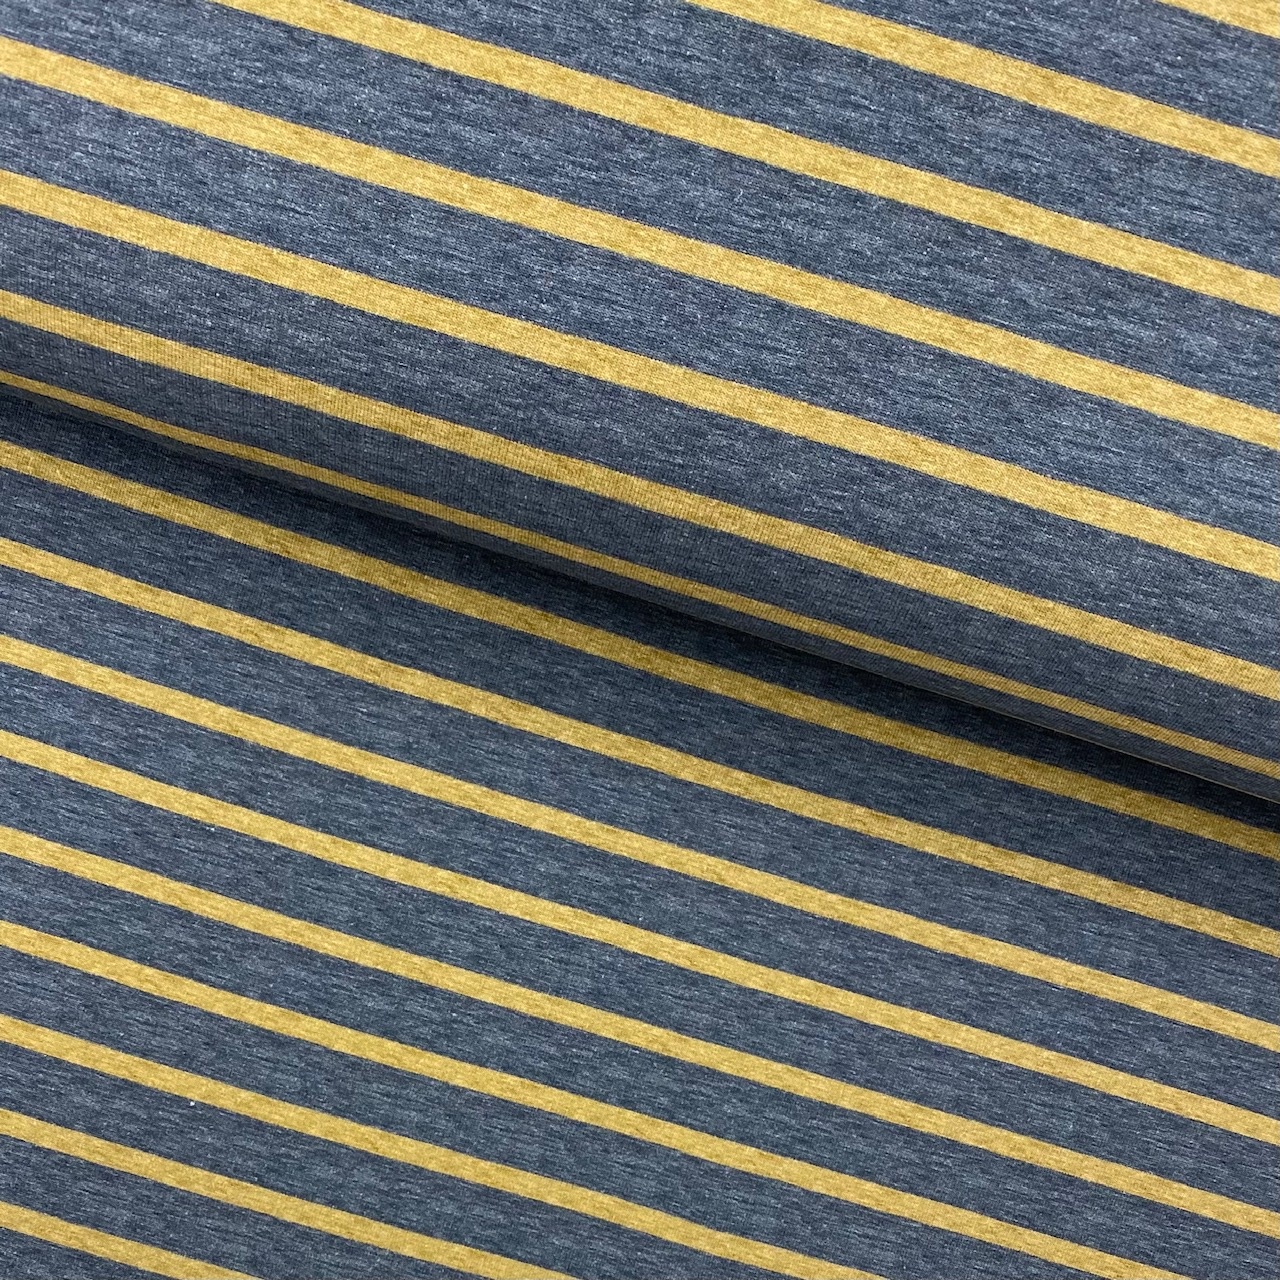 Sweat French Terry, angeraut, Streifen jeansblau/curry.  Art. 4982.1701